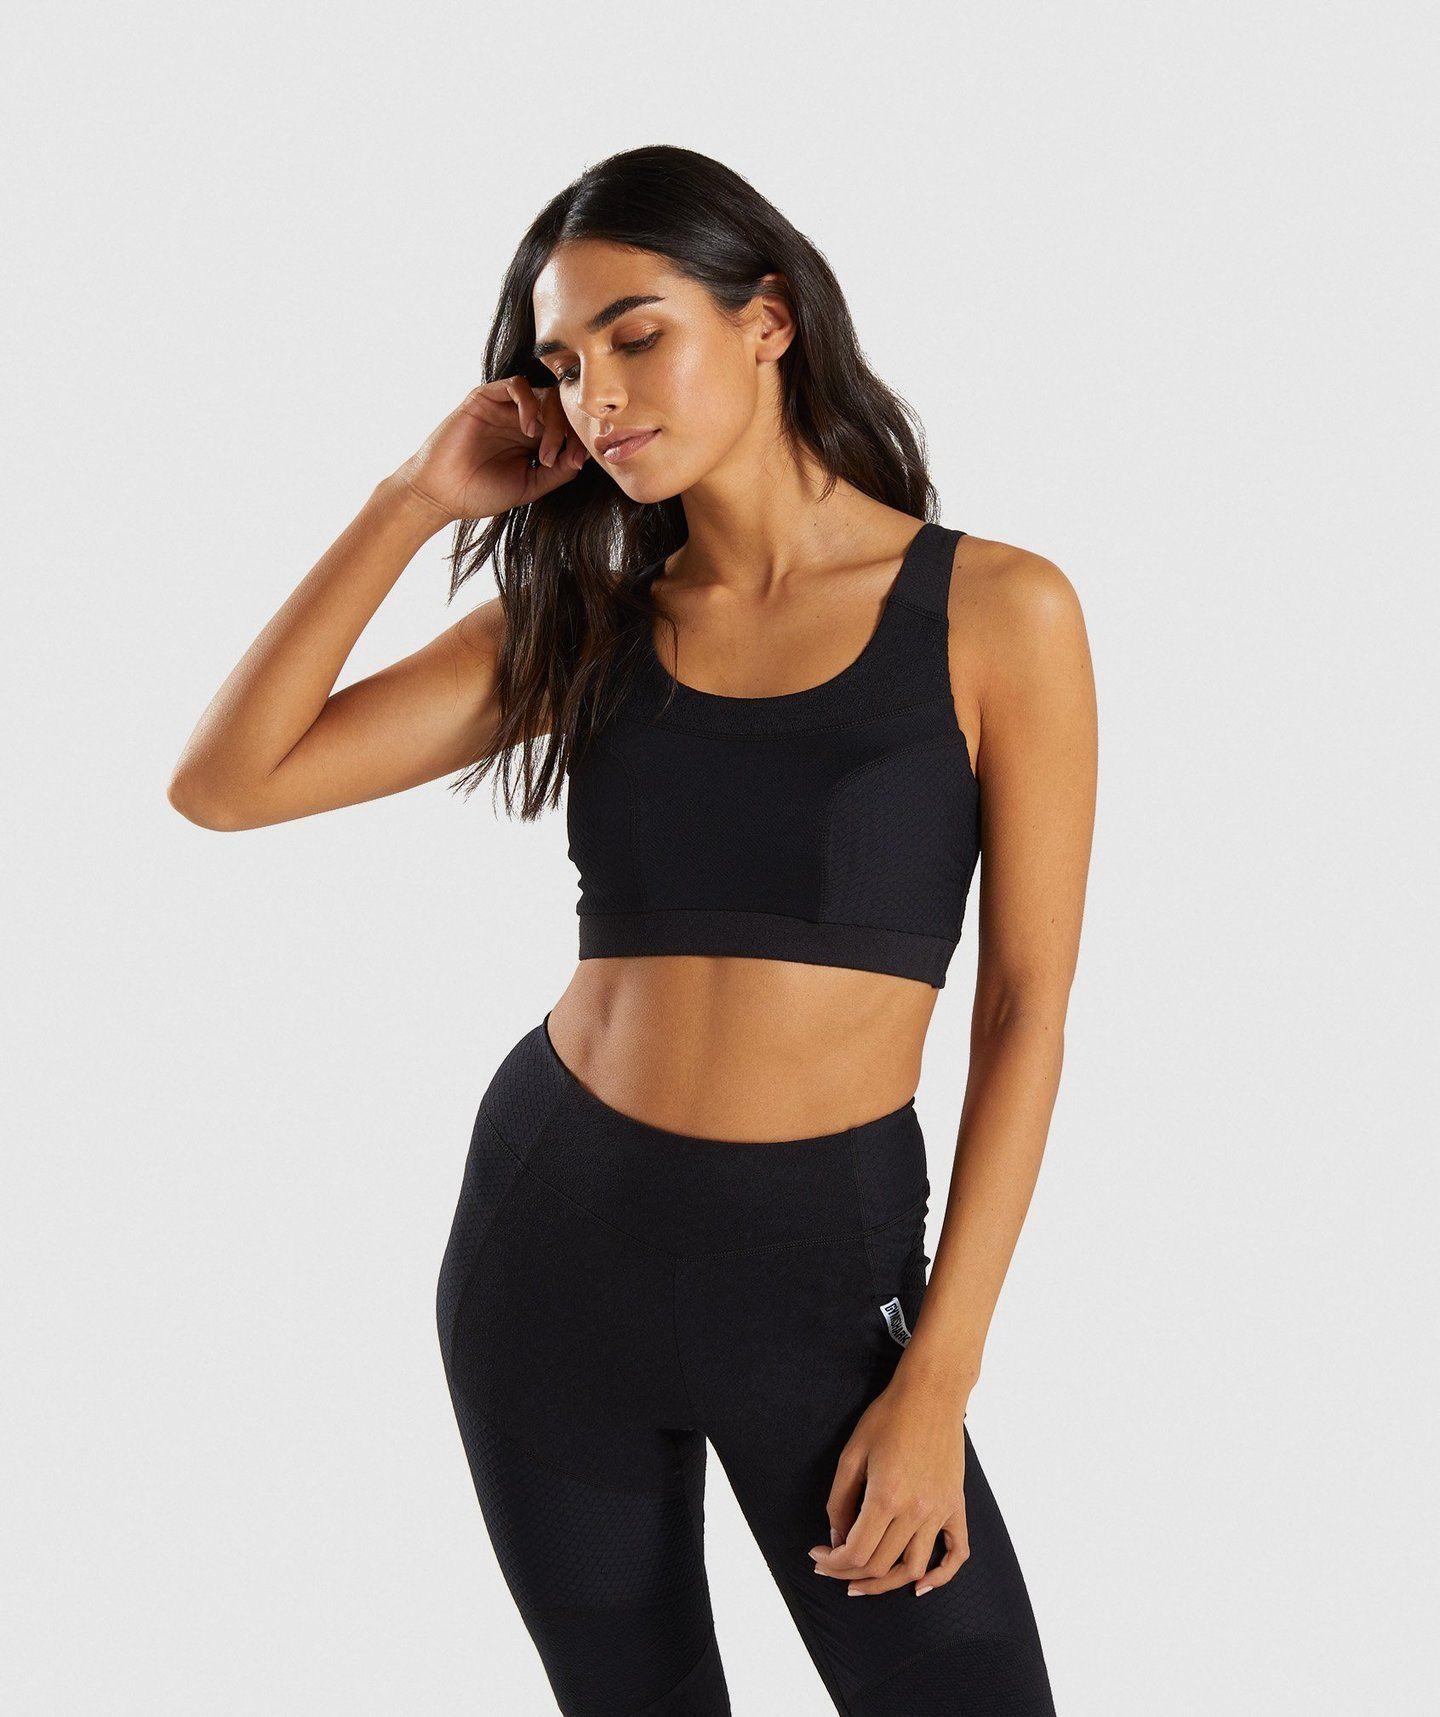 e733bbdd5ed7 Gymshark True Texture Sports Bra - Black in 2019 | Clothing | Sports ...